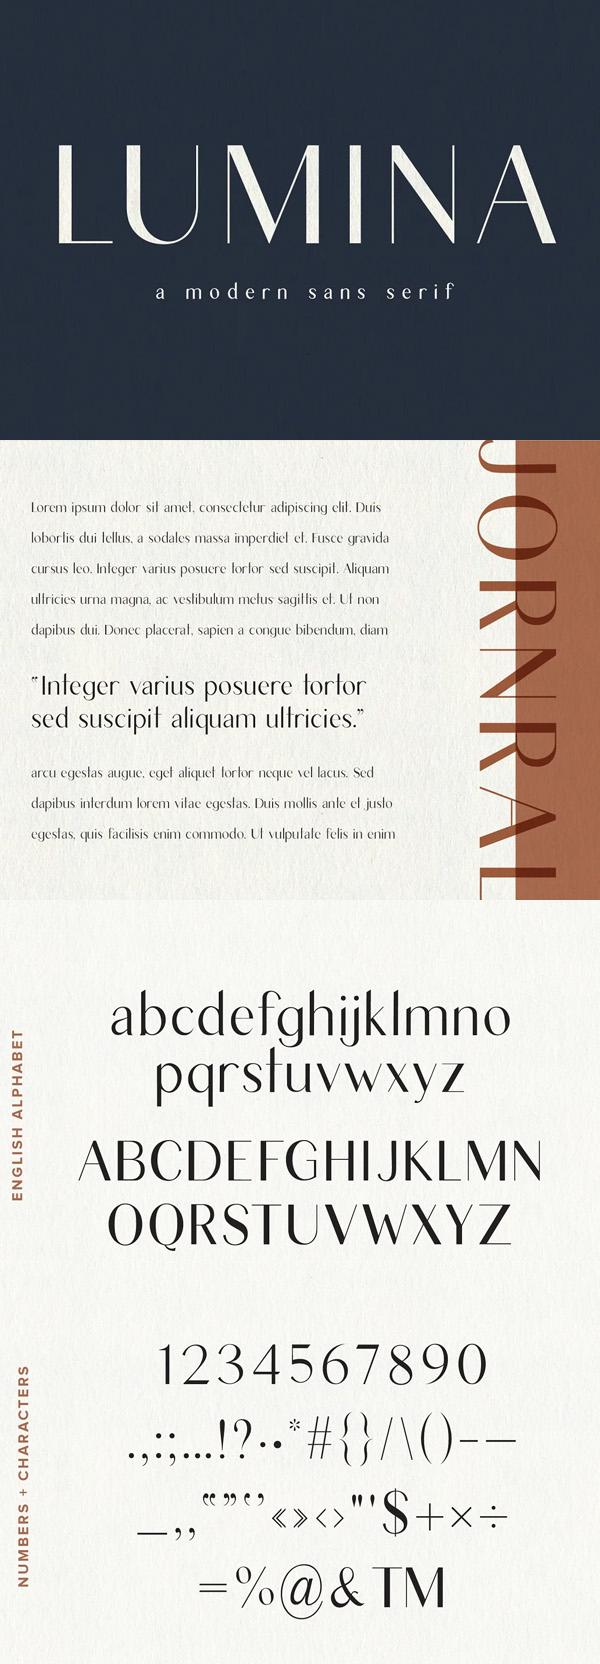 Lumina - Modern Sans Serif Free Font